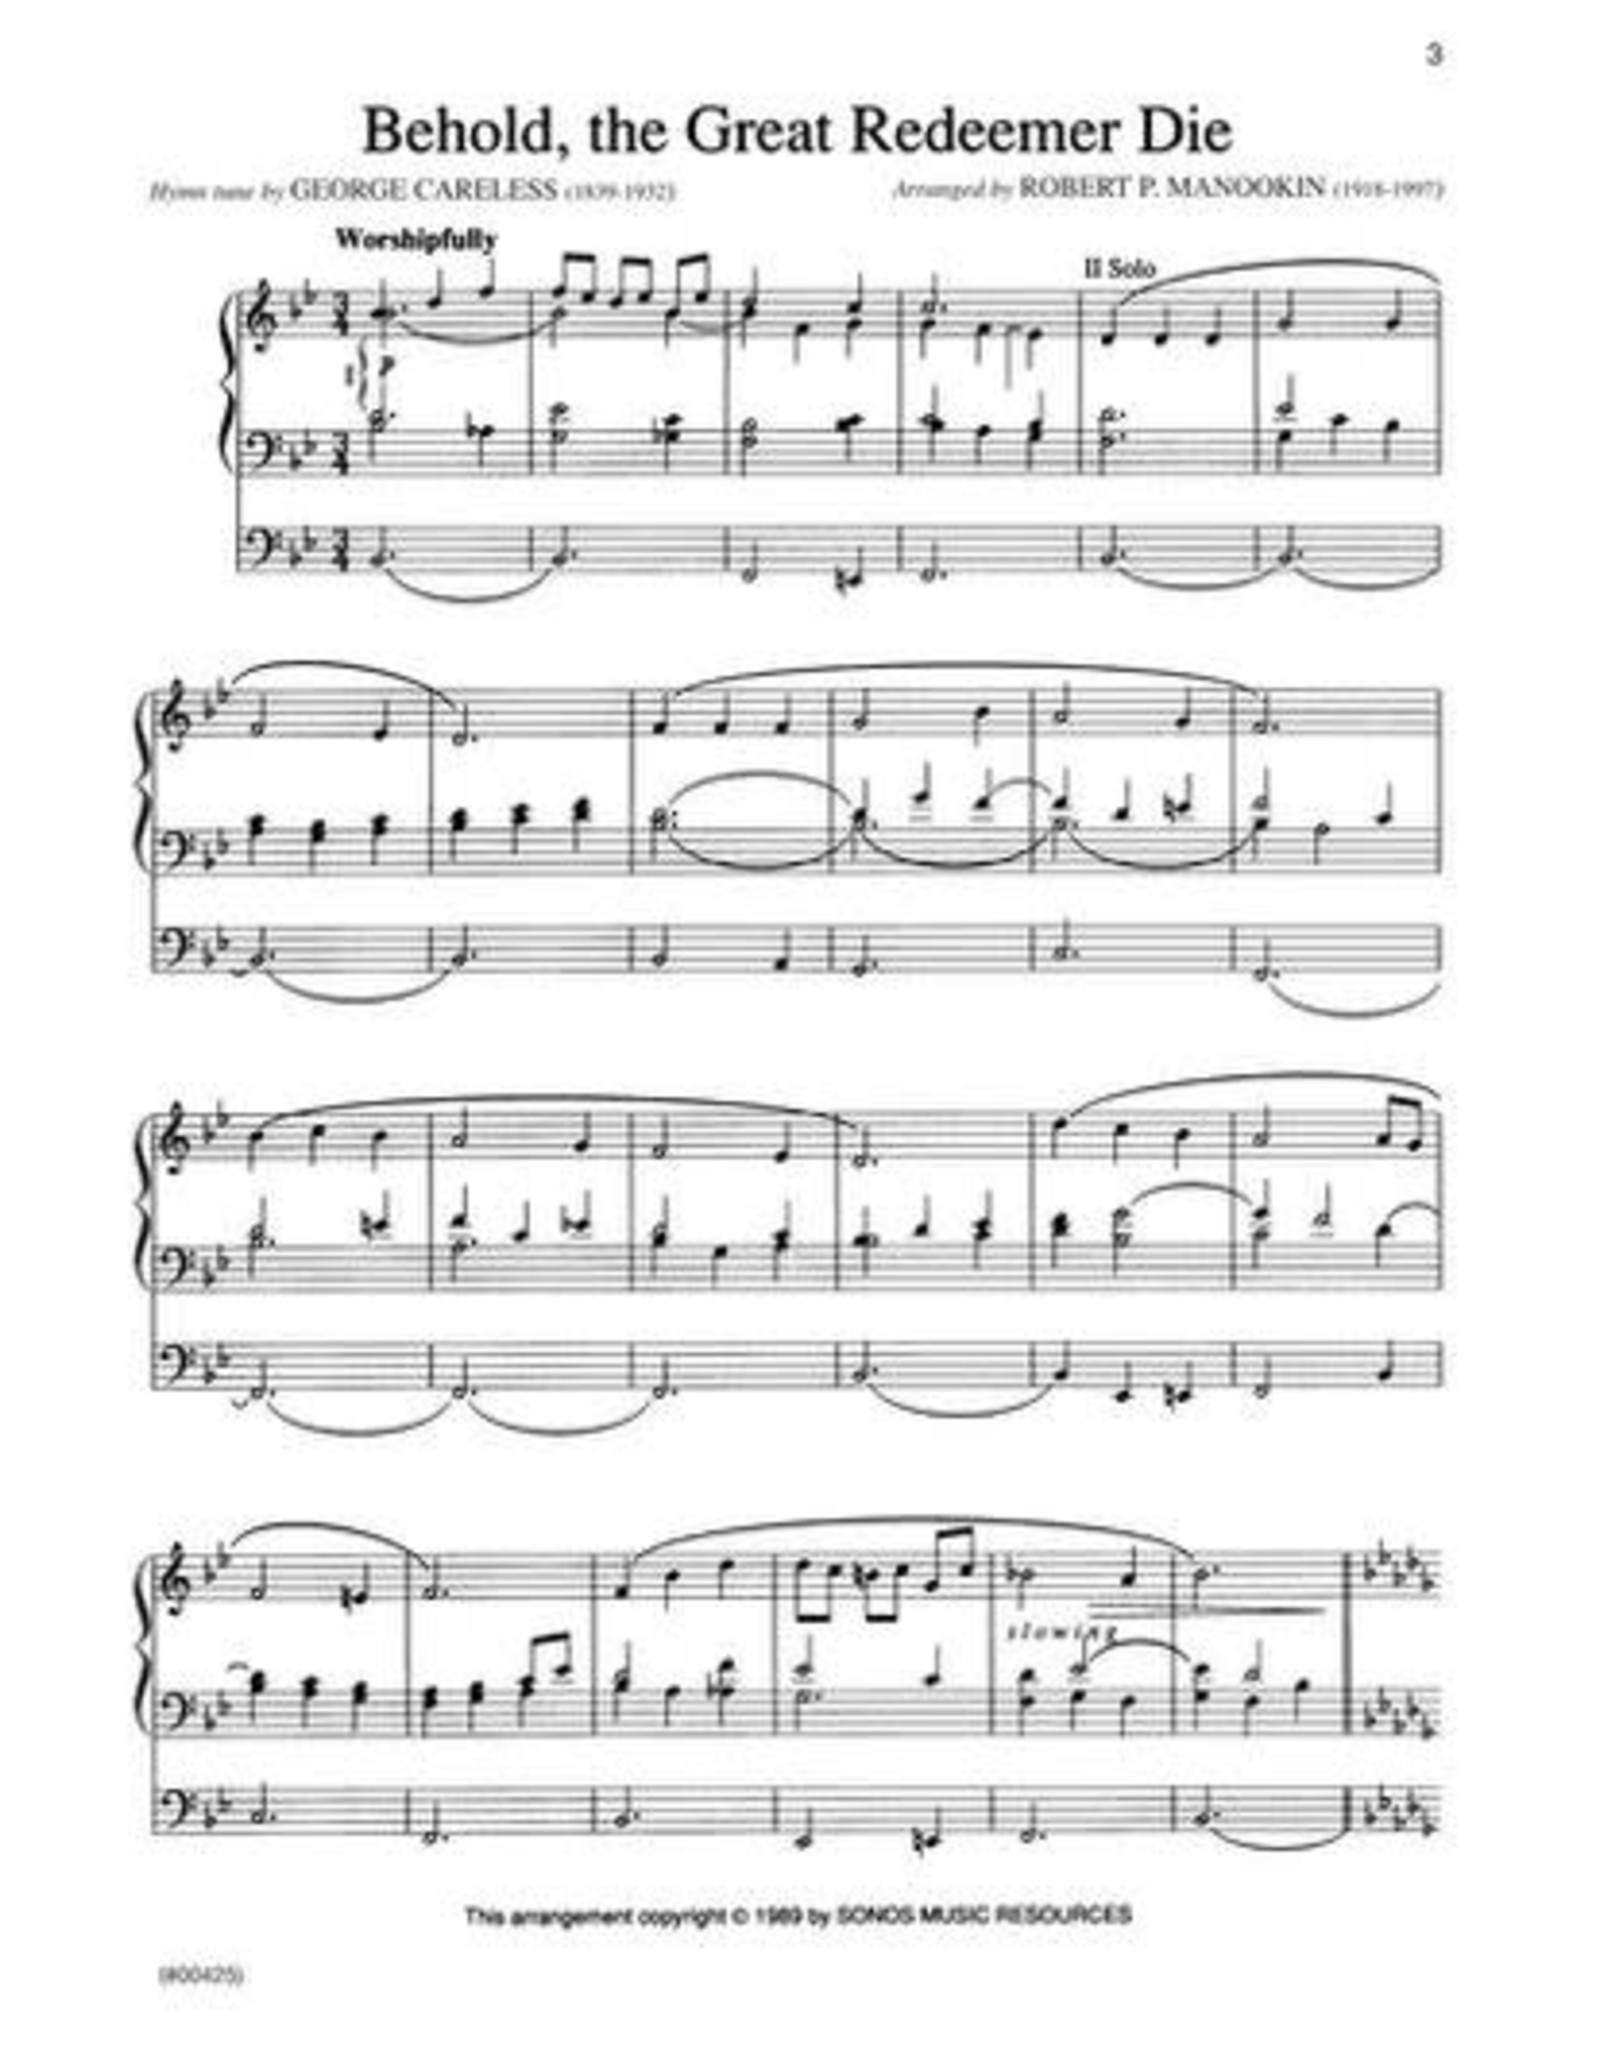 Jackman Music Hymn Preludes for Organ Book 7 arr. Robert P. Manookin